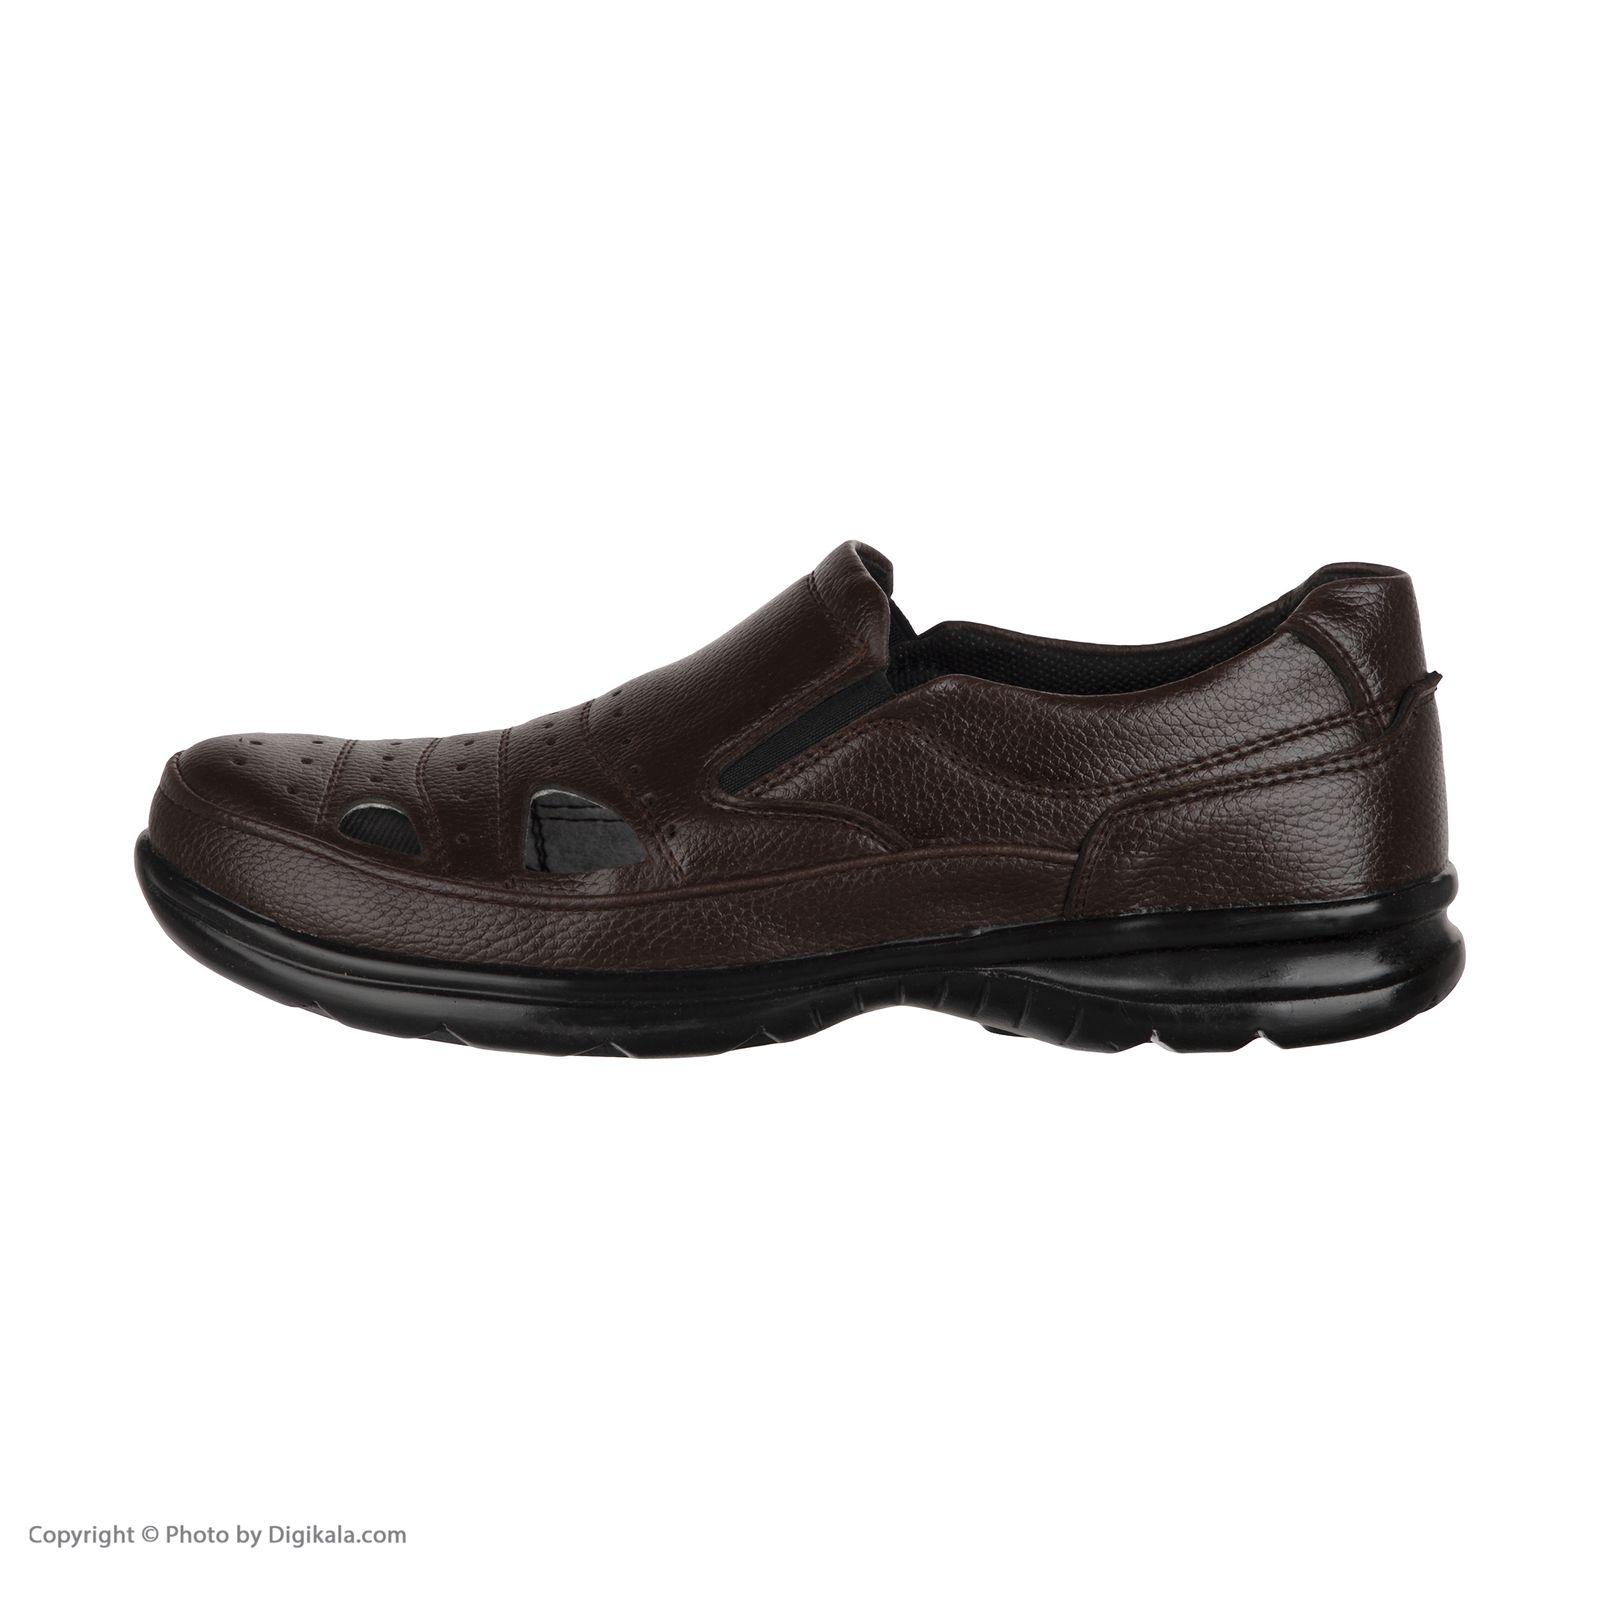 کفش روزمره مردانه مدل k.baz.076 -  - 3